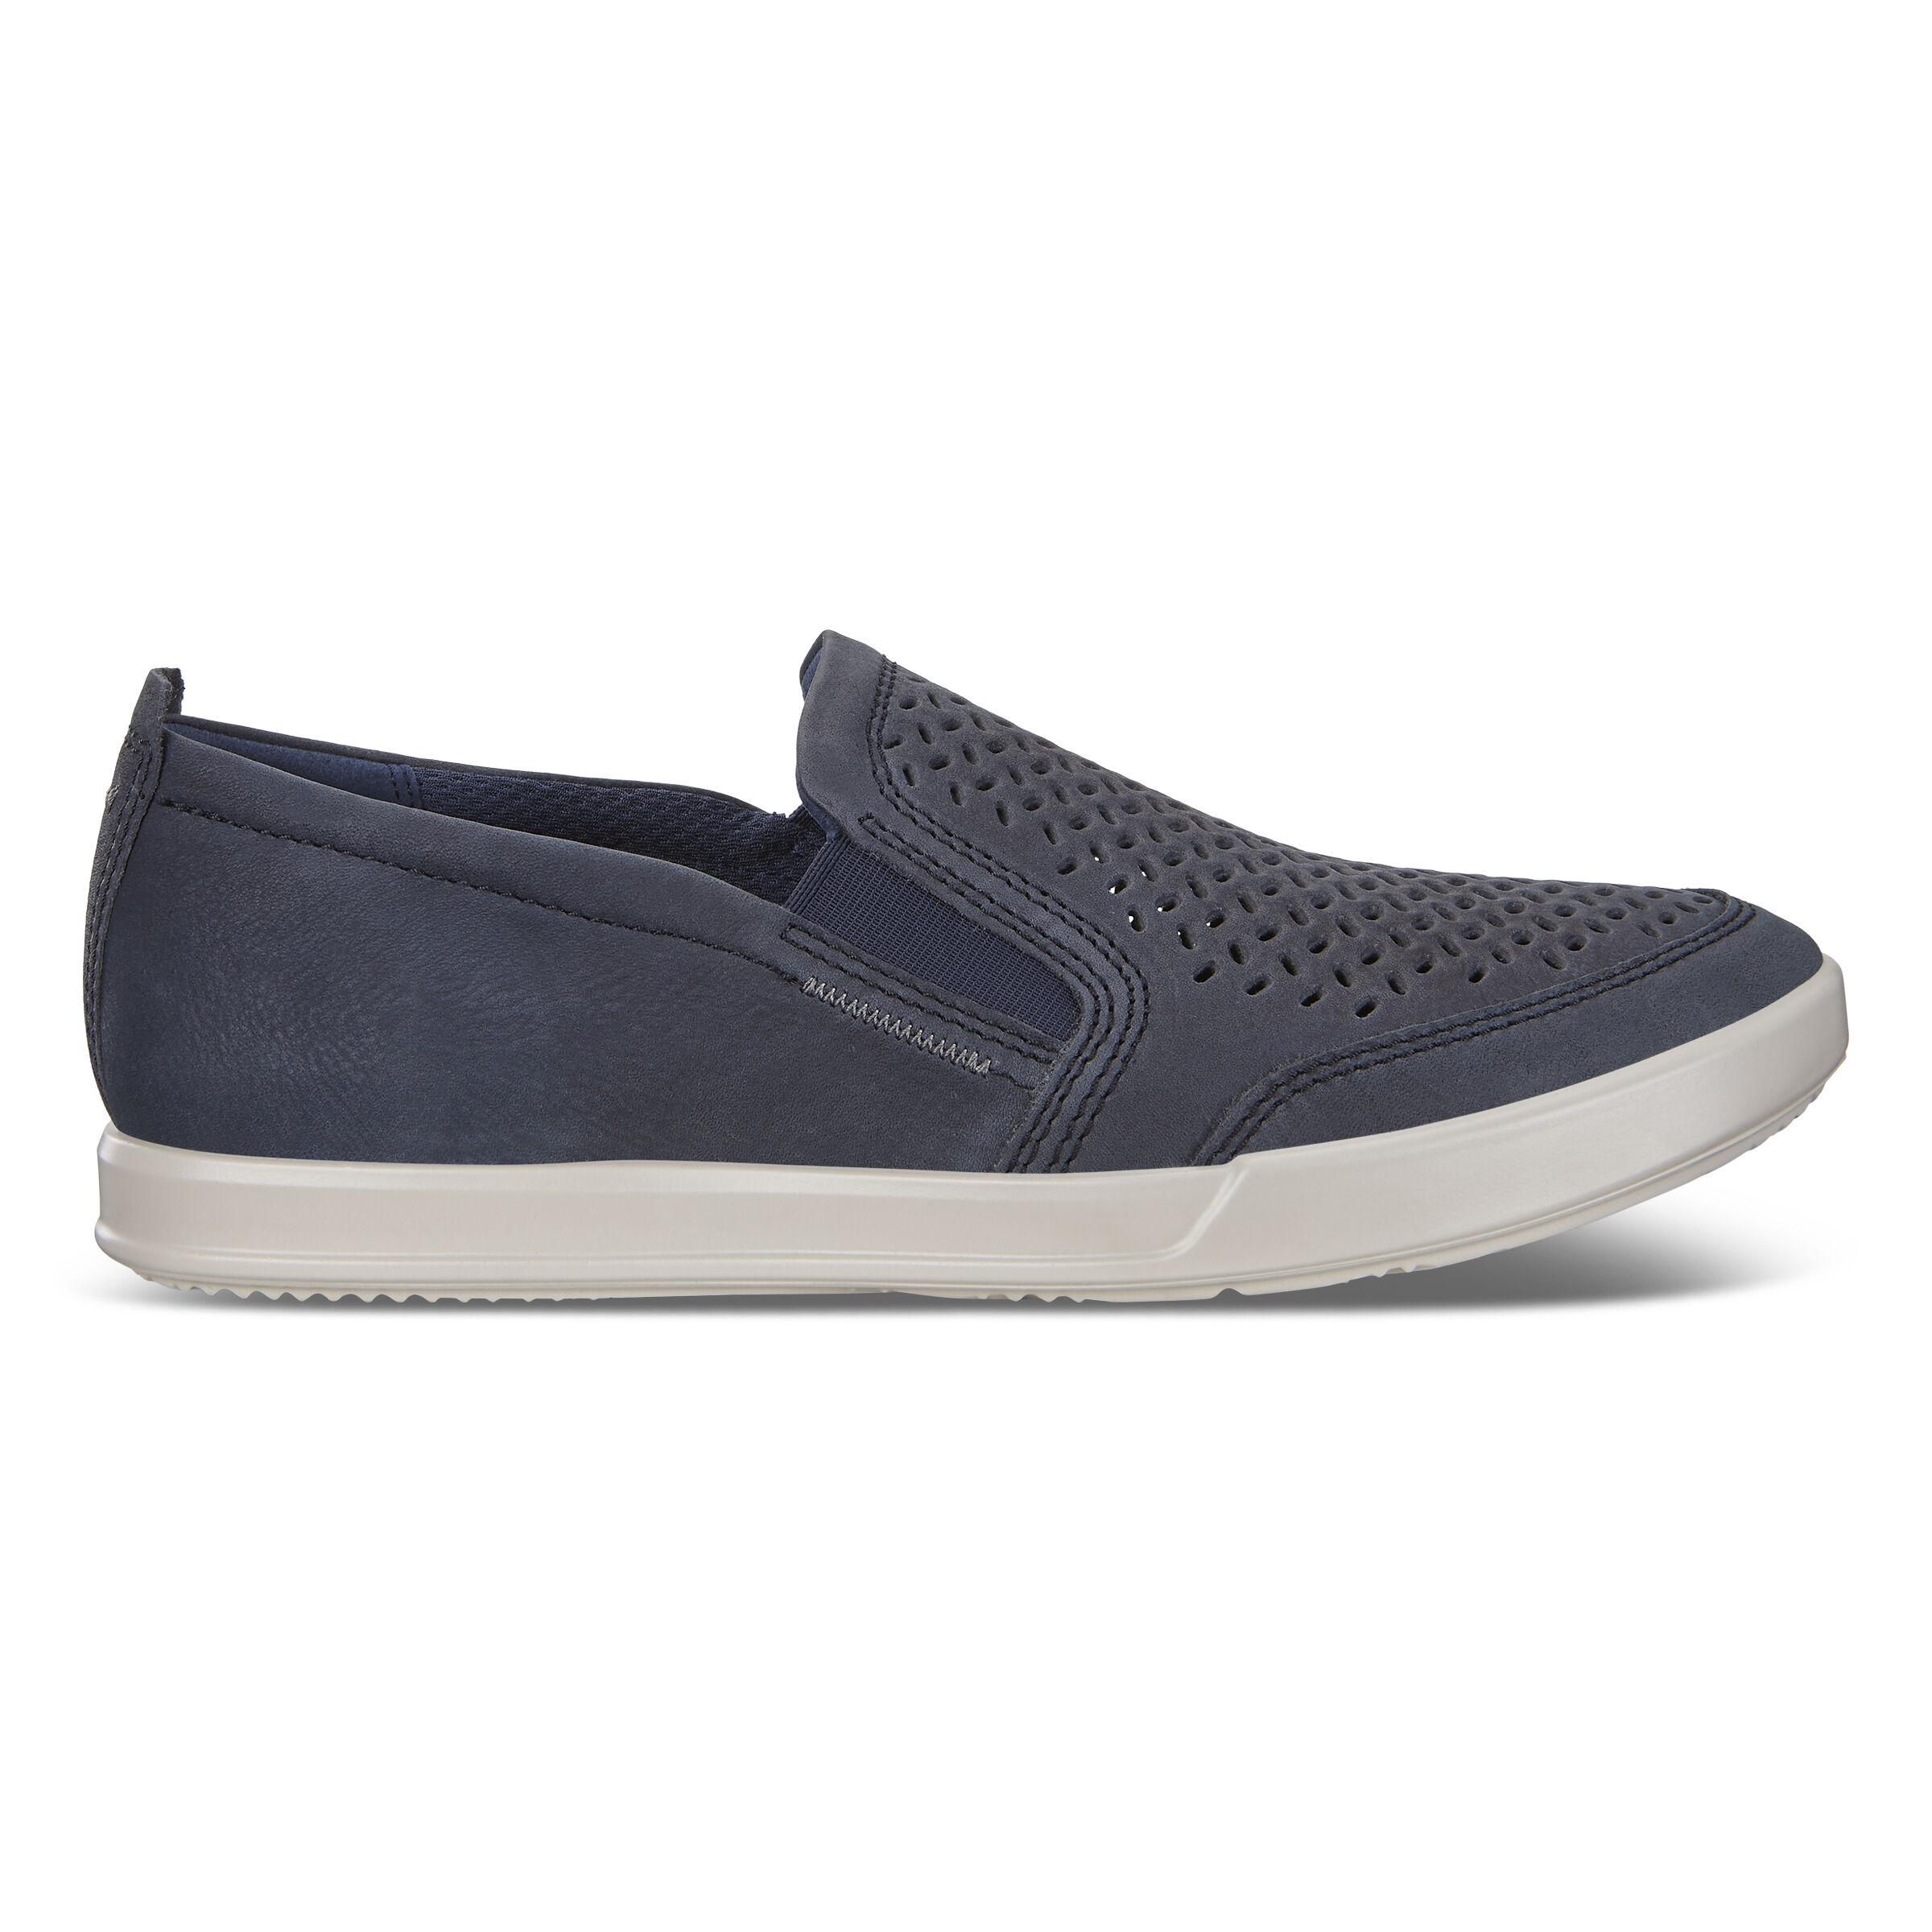 ECCO Shoes for Men for sale | eBay